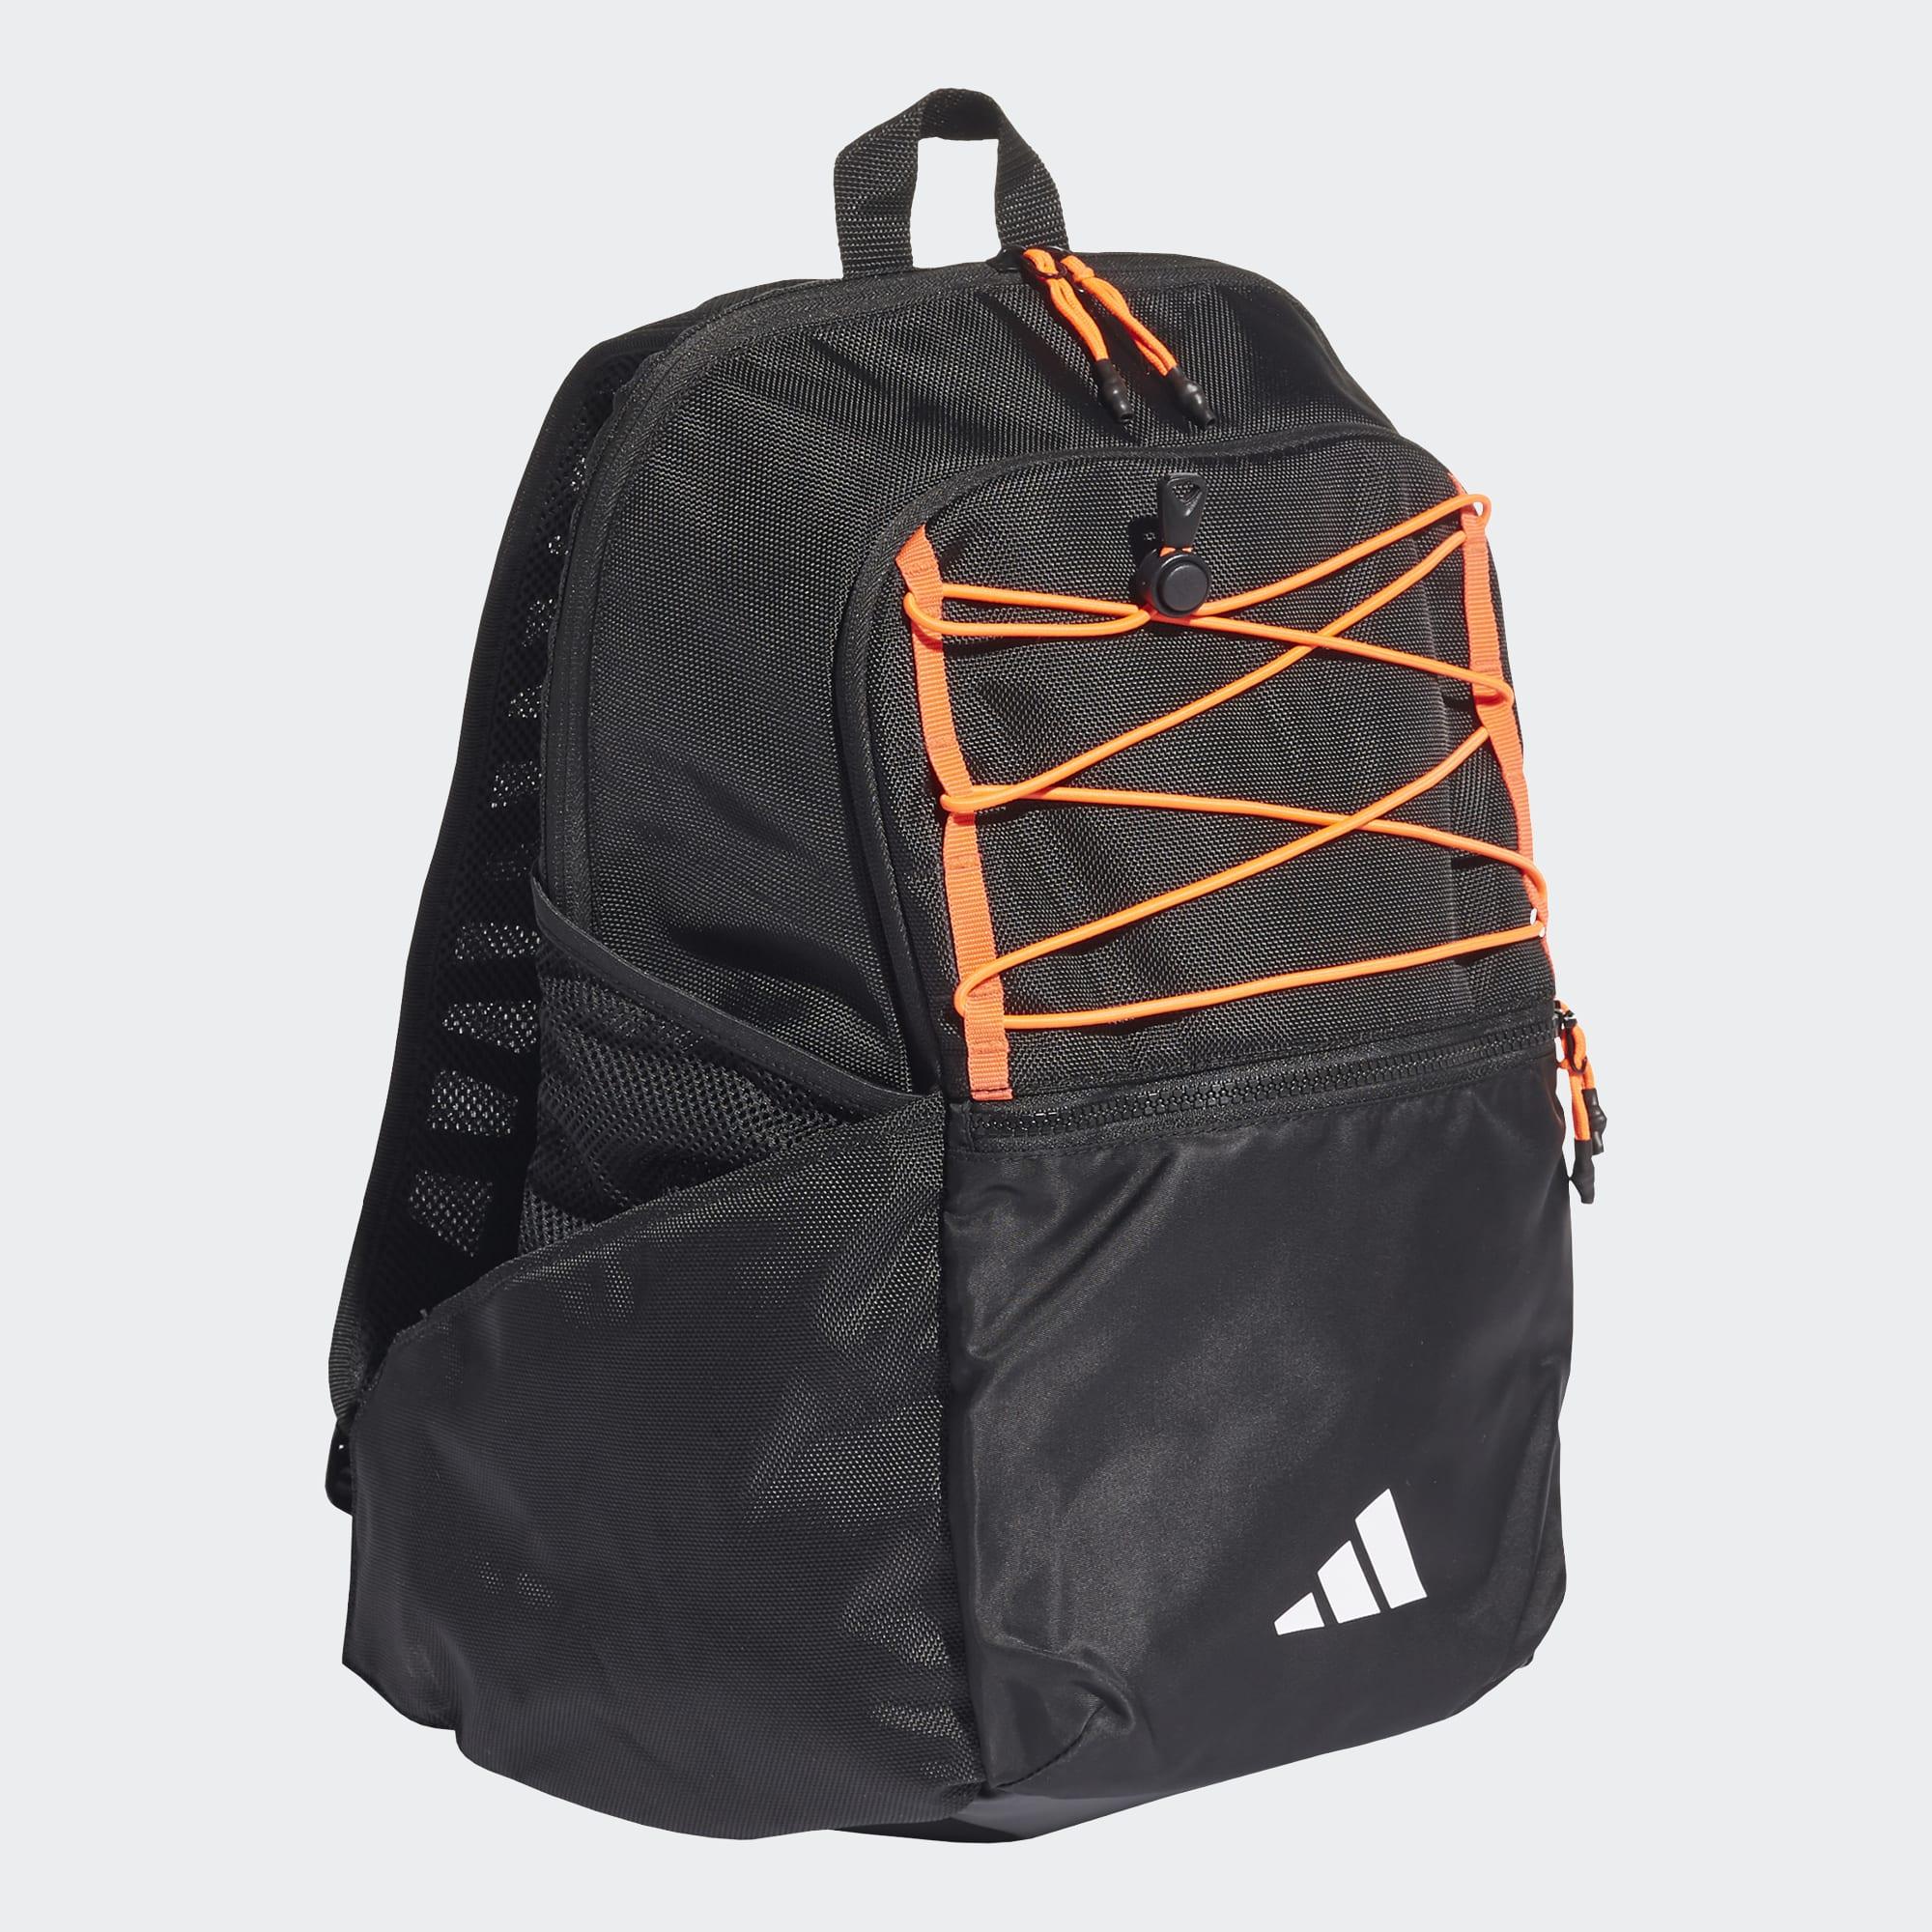 Adidas PARKHOOD A.R. Kinder-Rucksack